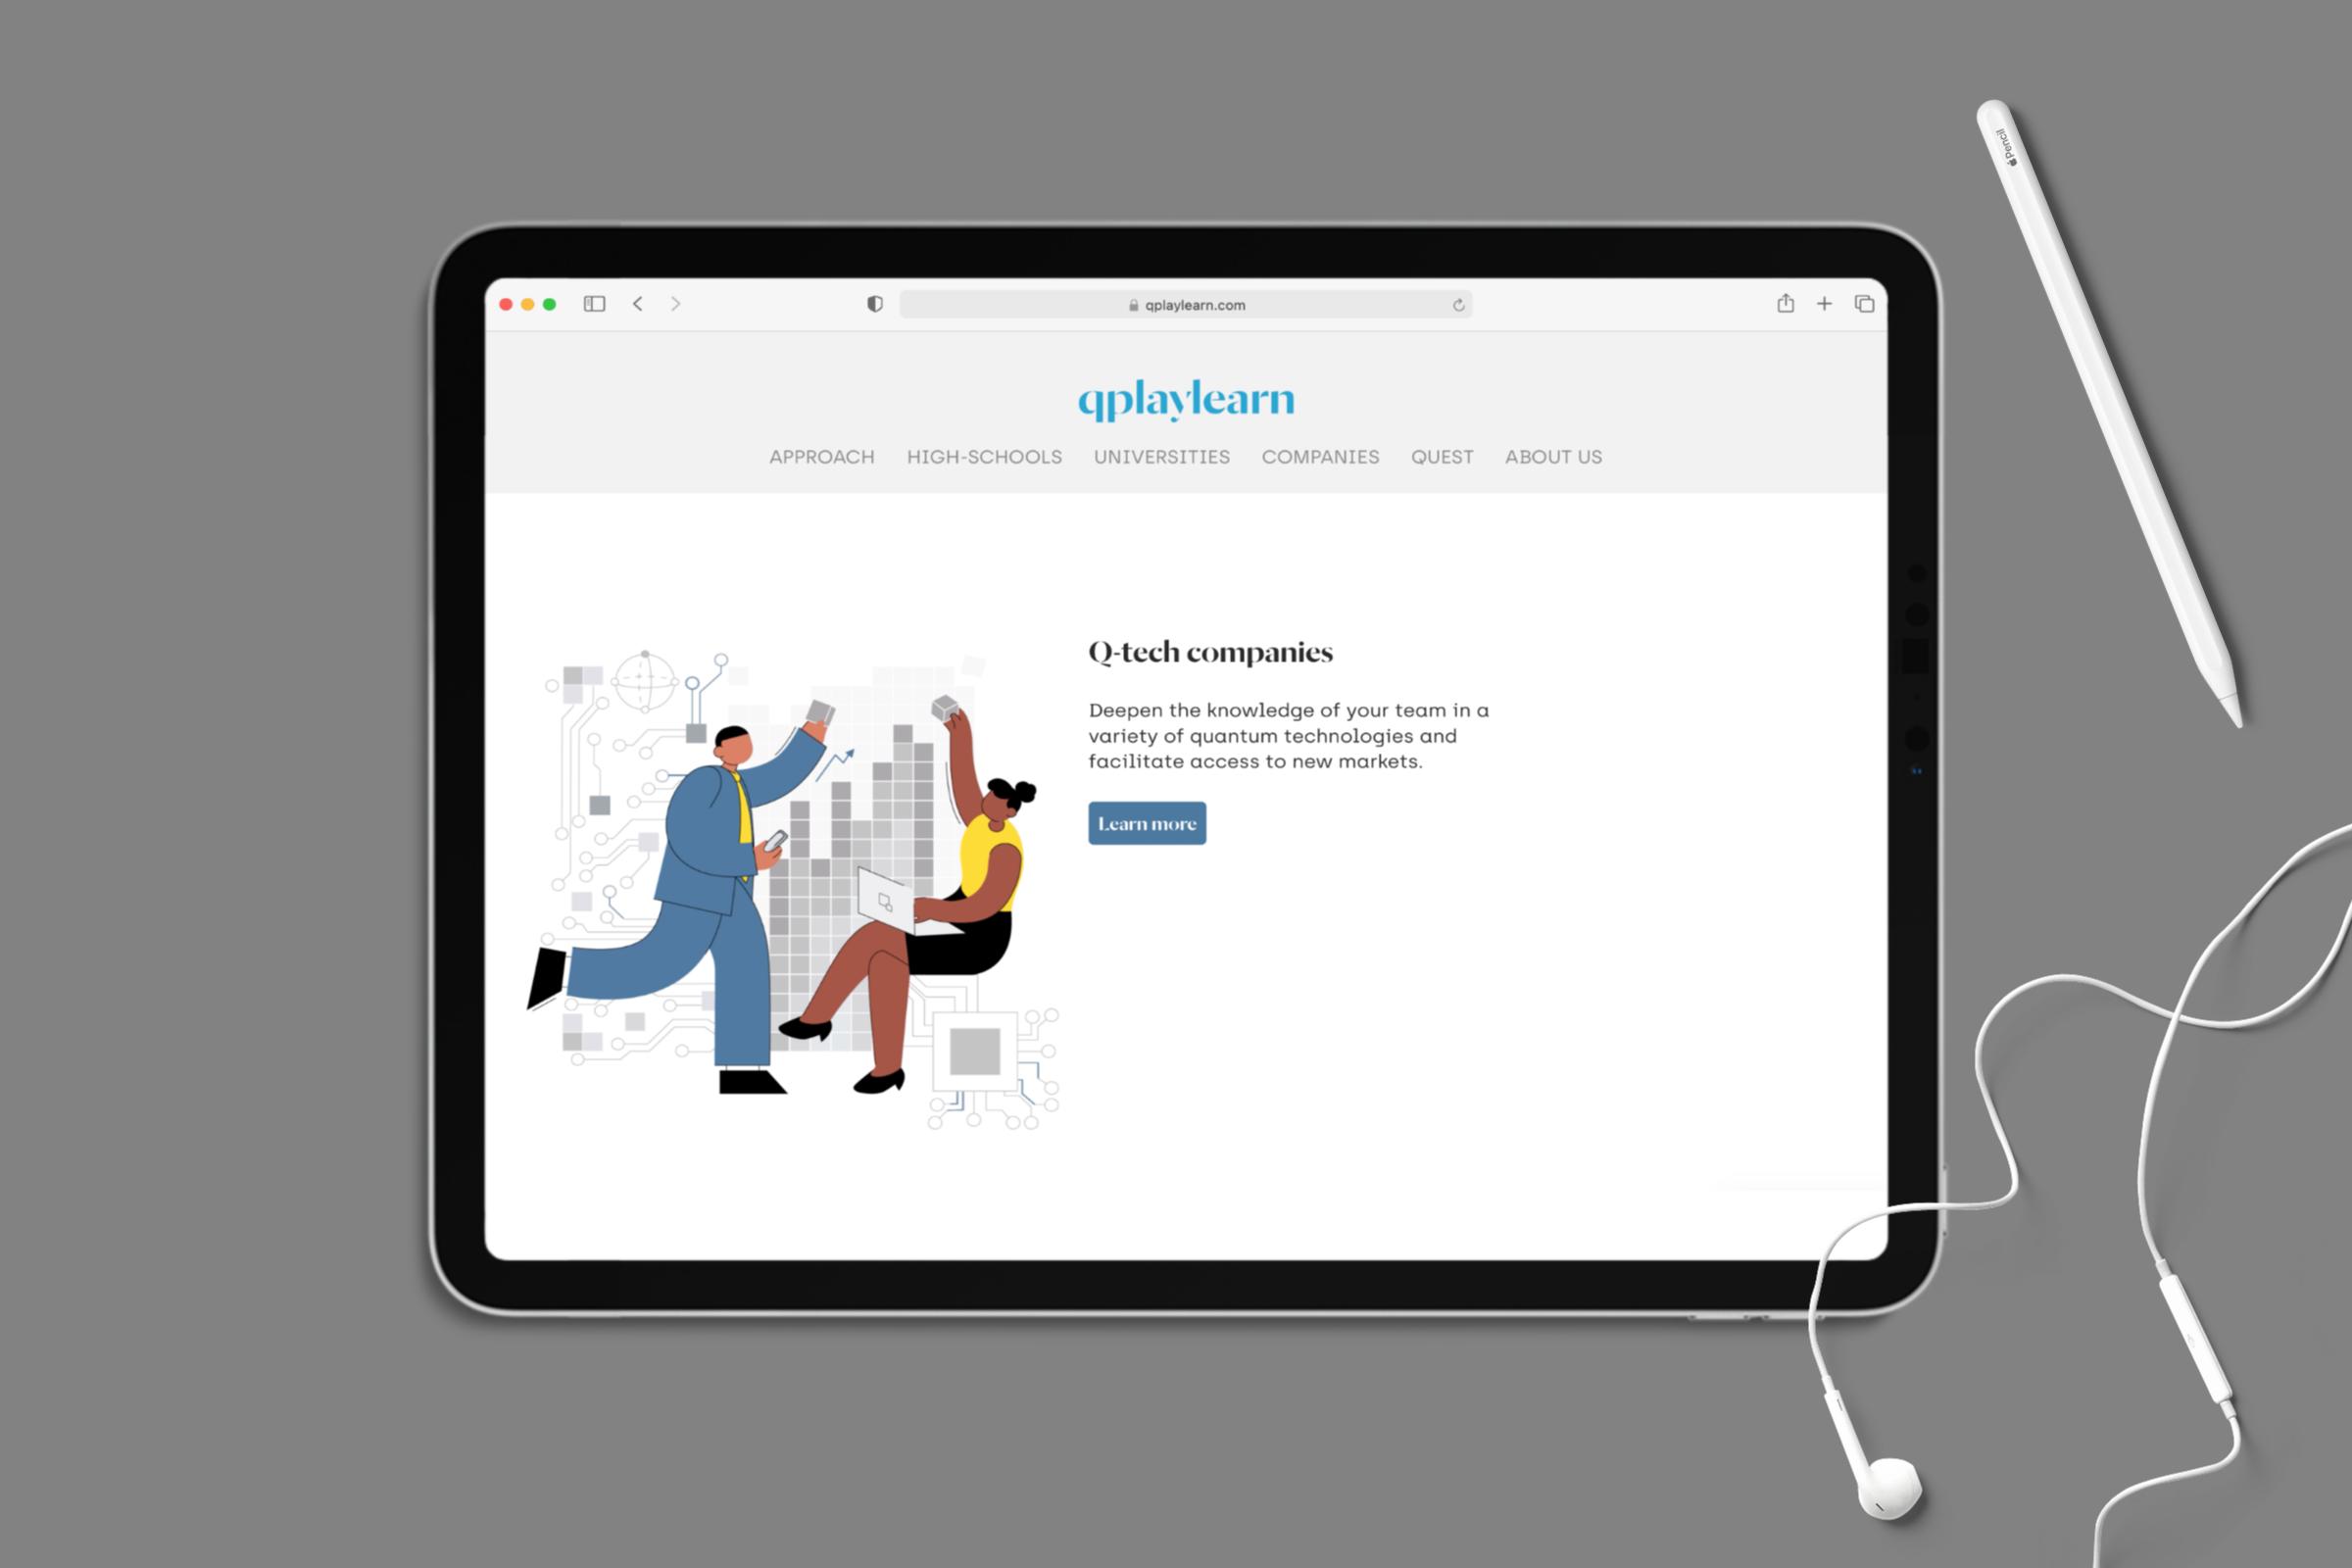 Qplaylearn-web-design-5